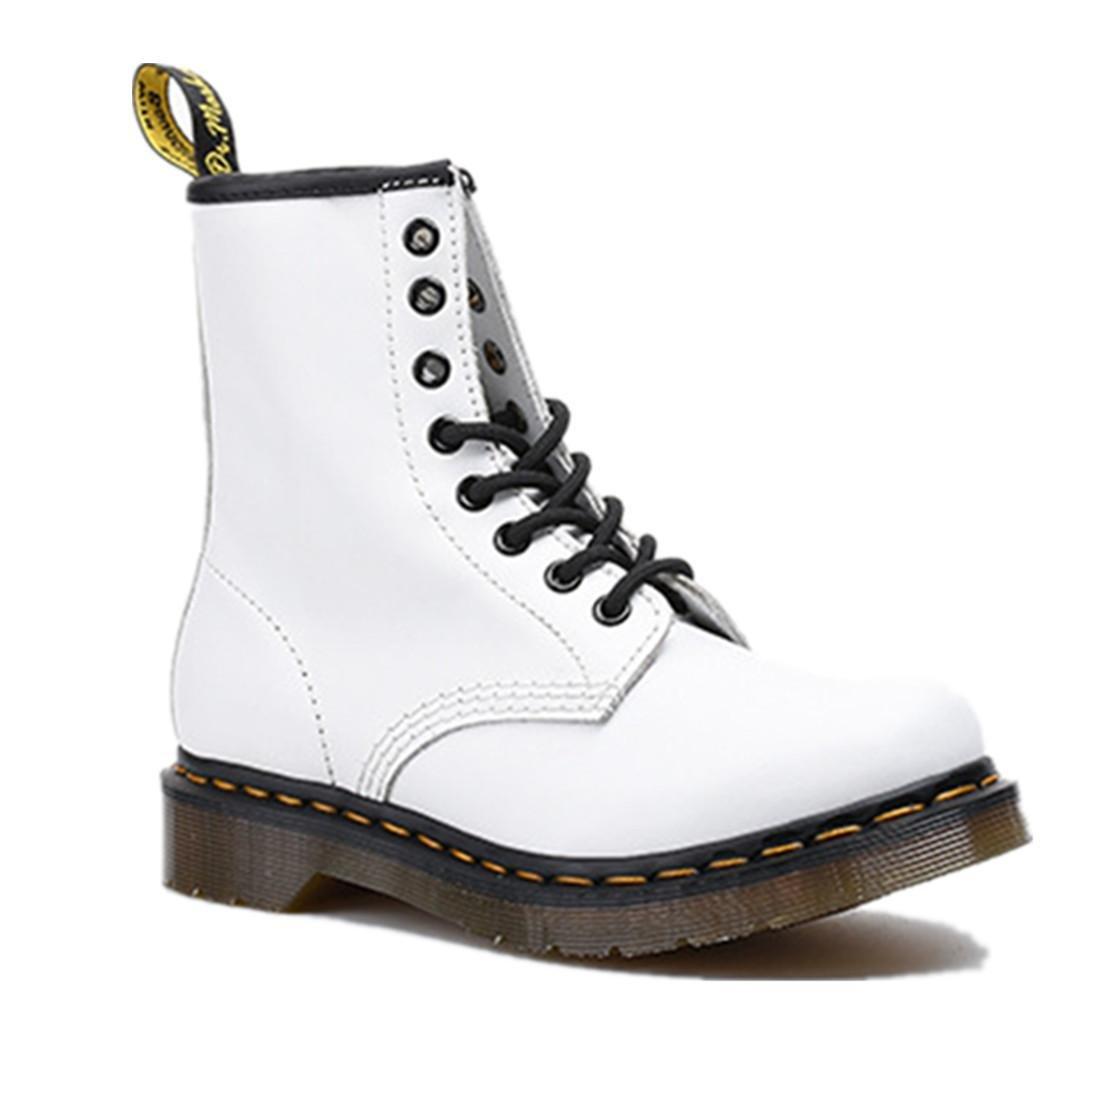 NVXIE Damen Männer Kurze Stiefel Paar Schuhe Flache Neue Mode Martin Lokomotivstiefel Schnüren Sich Oben Echtes Leder Anti-Verschleiß Anti-Rutsch Weißer Frühling Herbst Winter